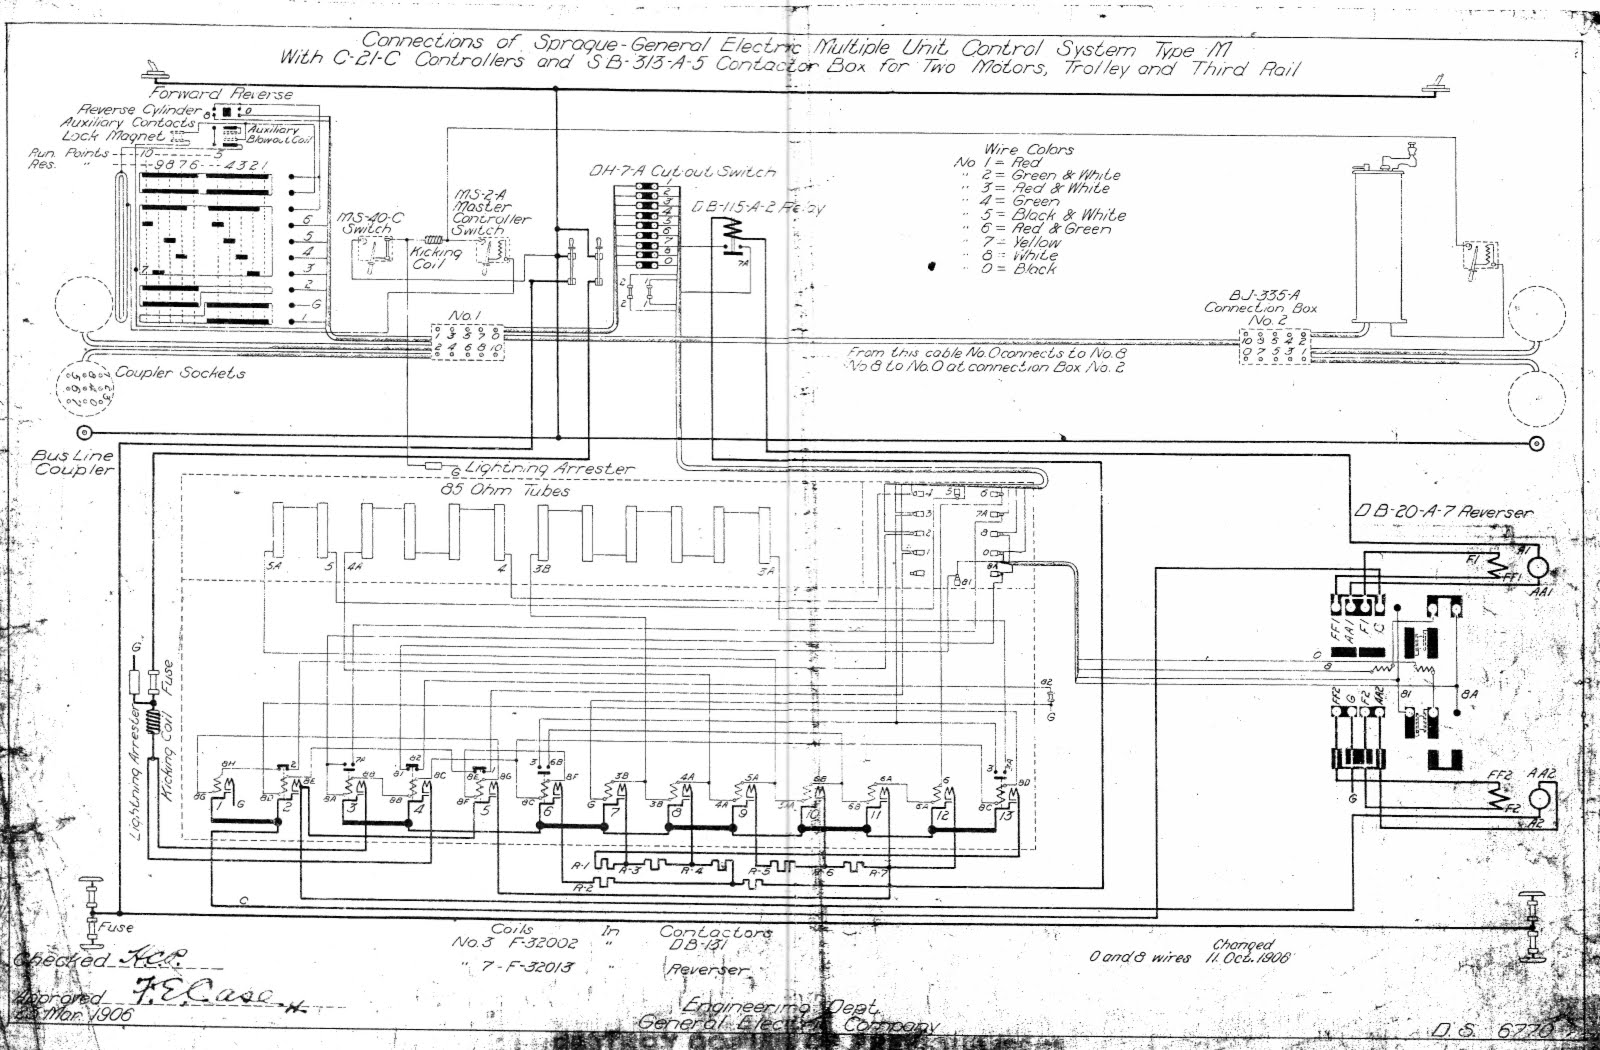 wrg 4699 isuzu w3500 fuse box diagramisuzu w3500 fuse box diagram 8 [ 1600 x 1050 Pixel ]